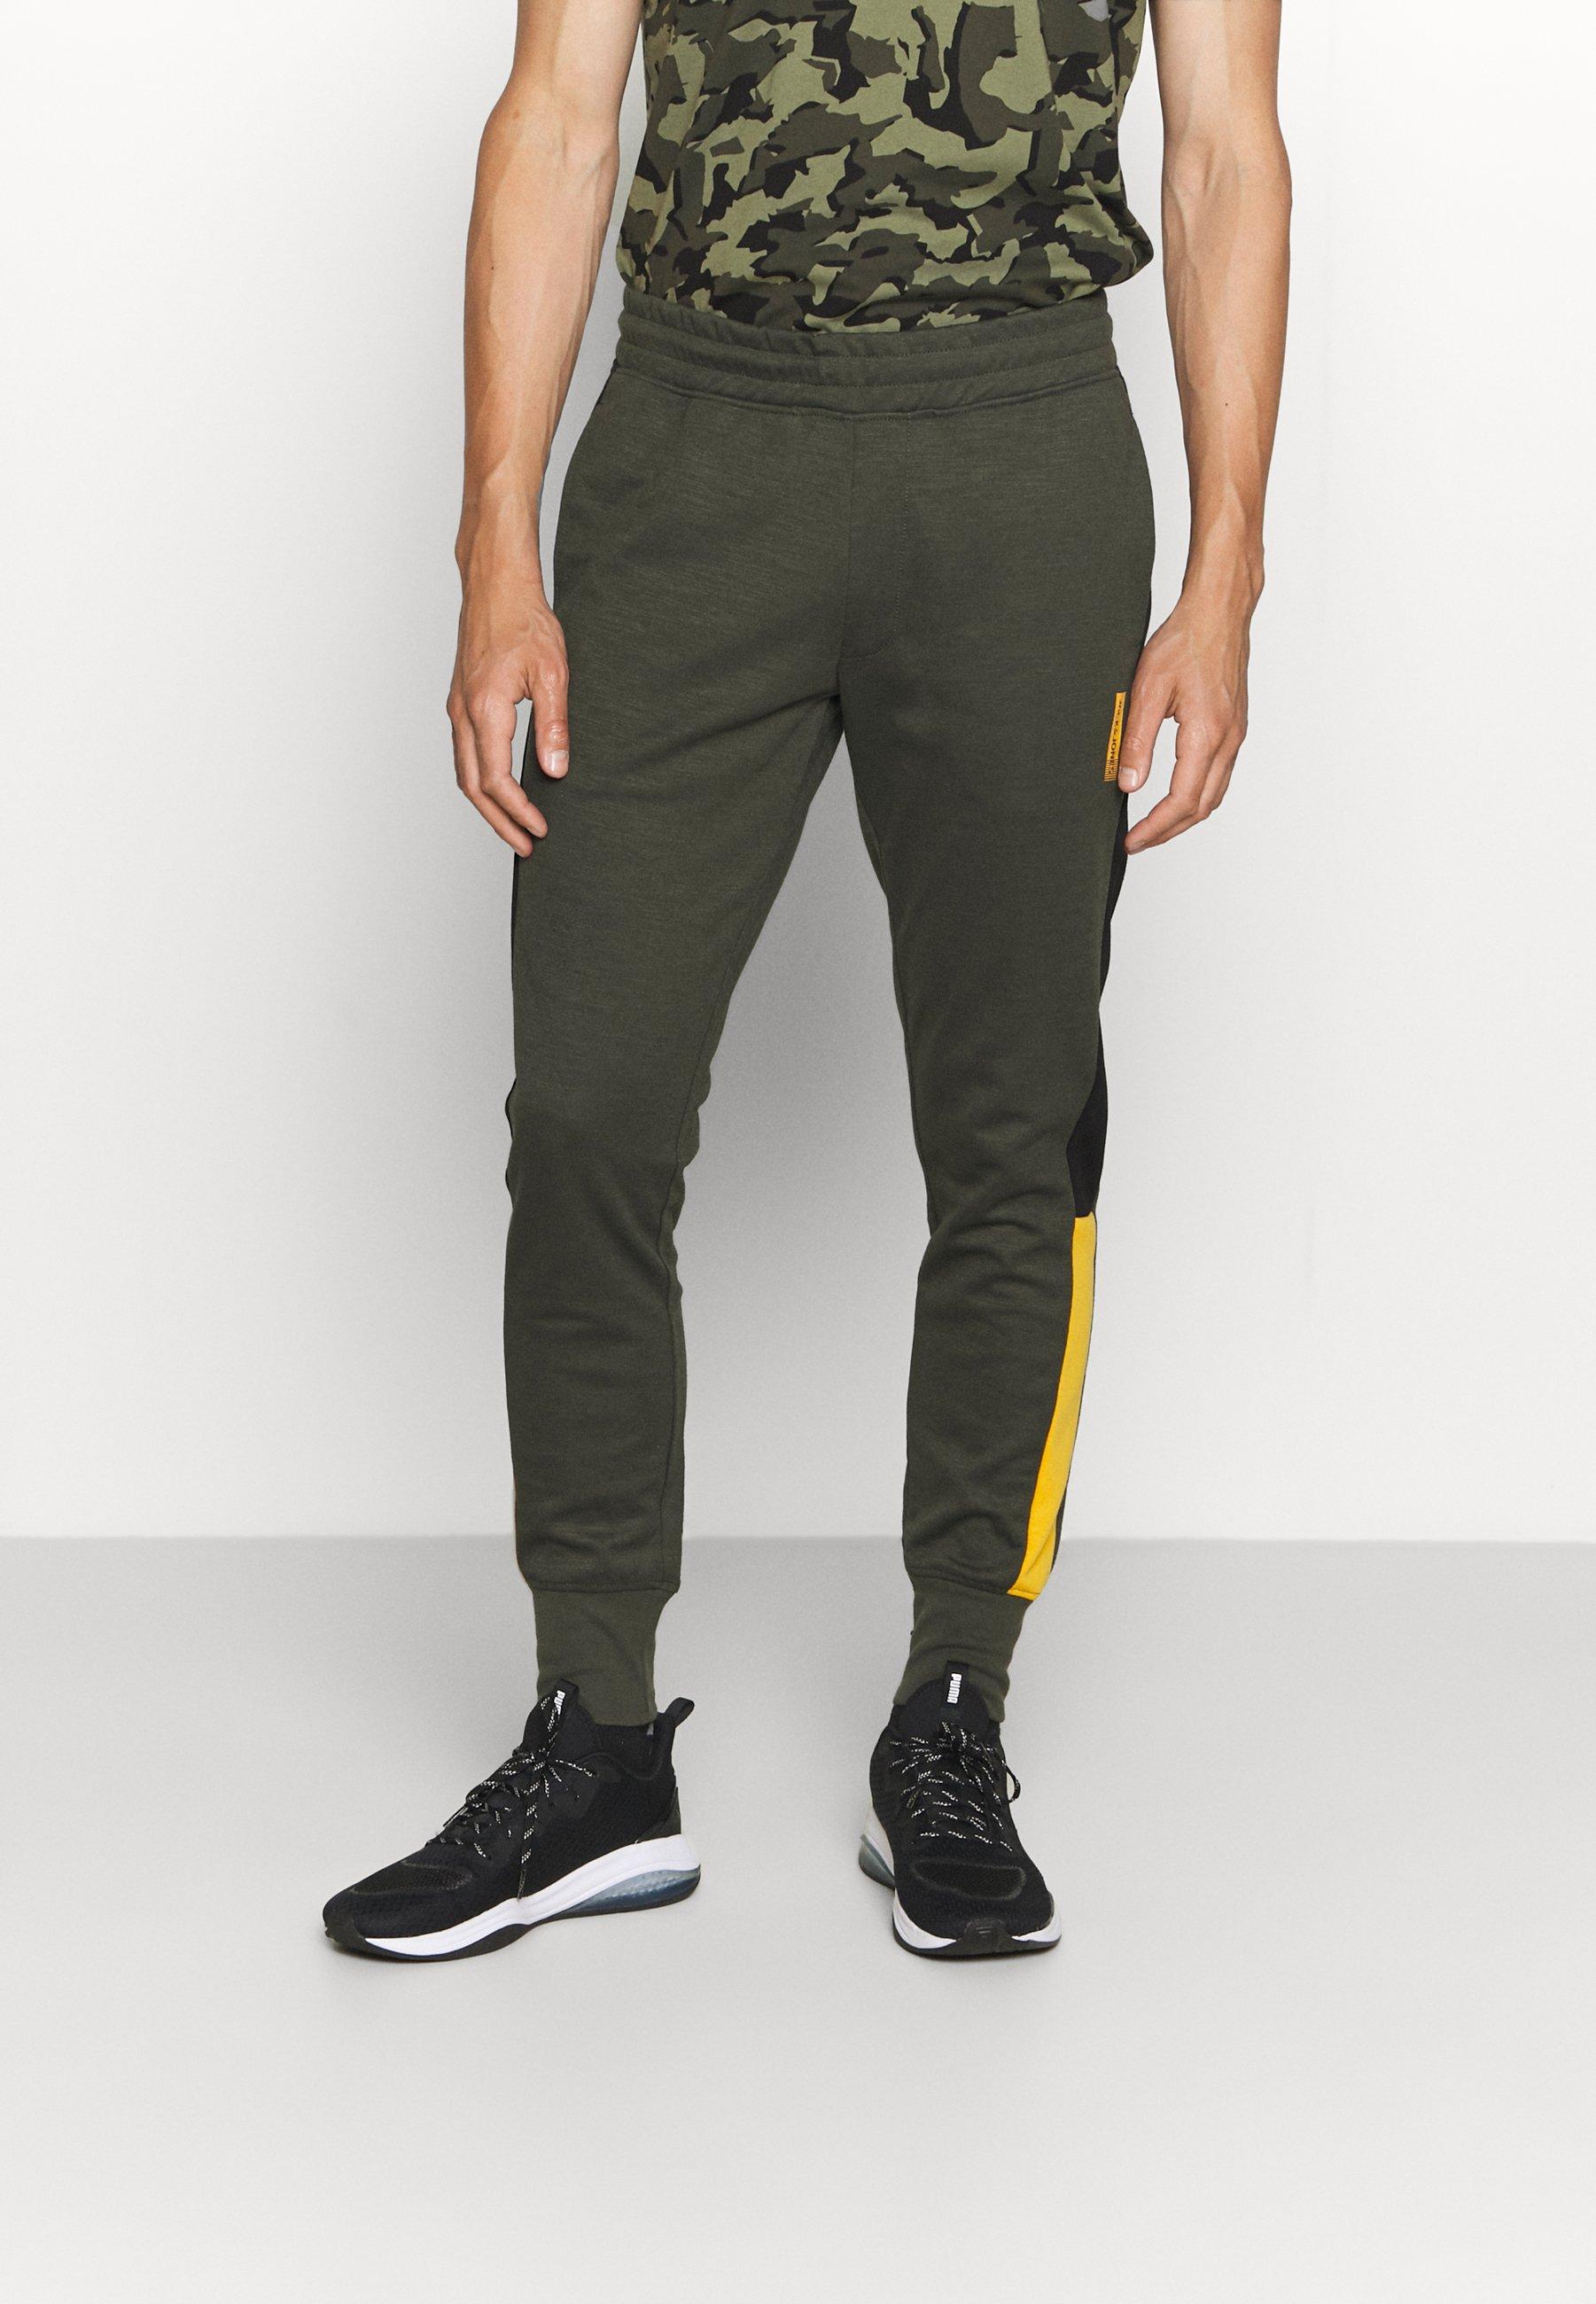 Homme JJIWILL ZSTRIPE PANTS - Pantalon de survêtement